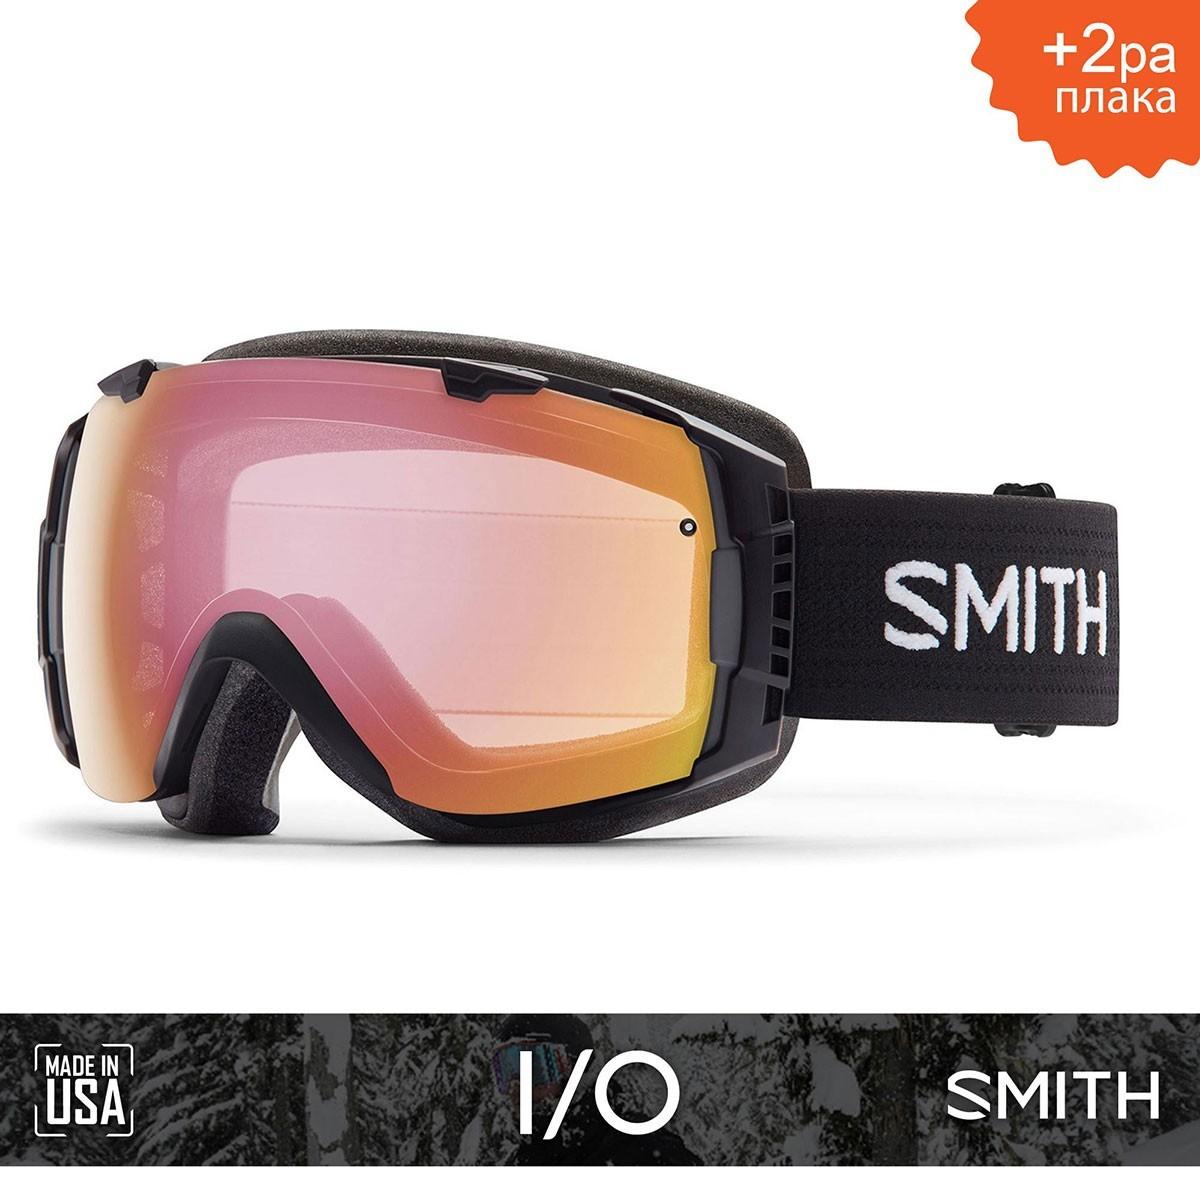 SMITH I/O Black | S1 YELLOW Flash - Изображение - AQUAMATRIX